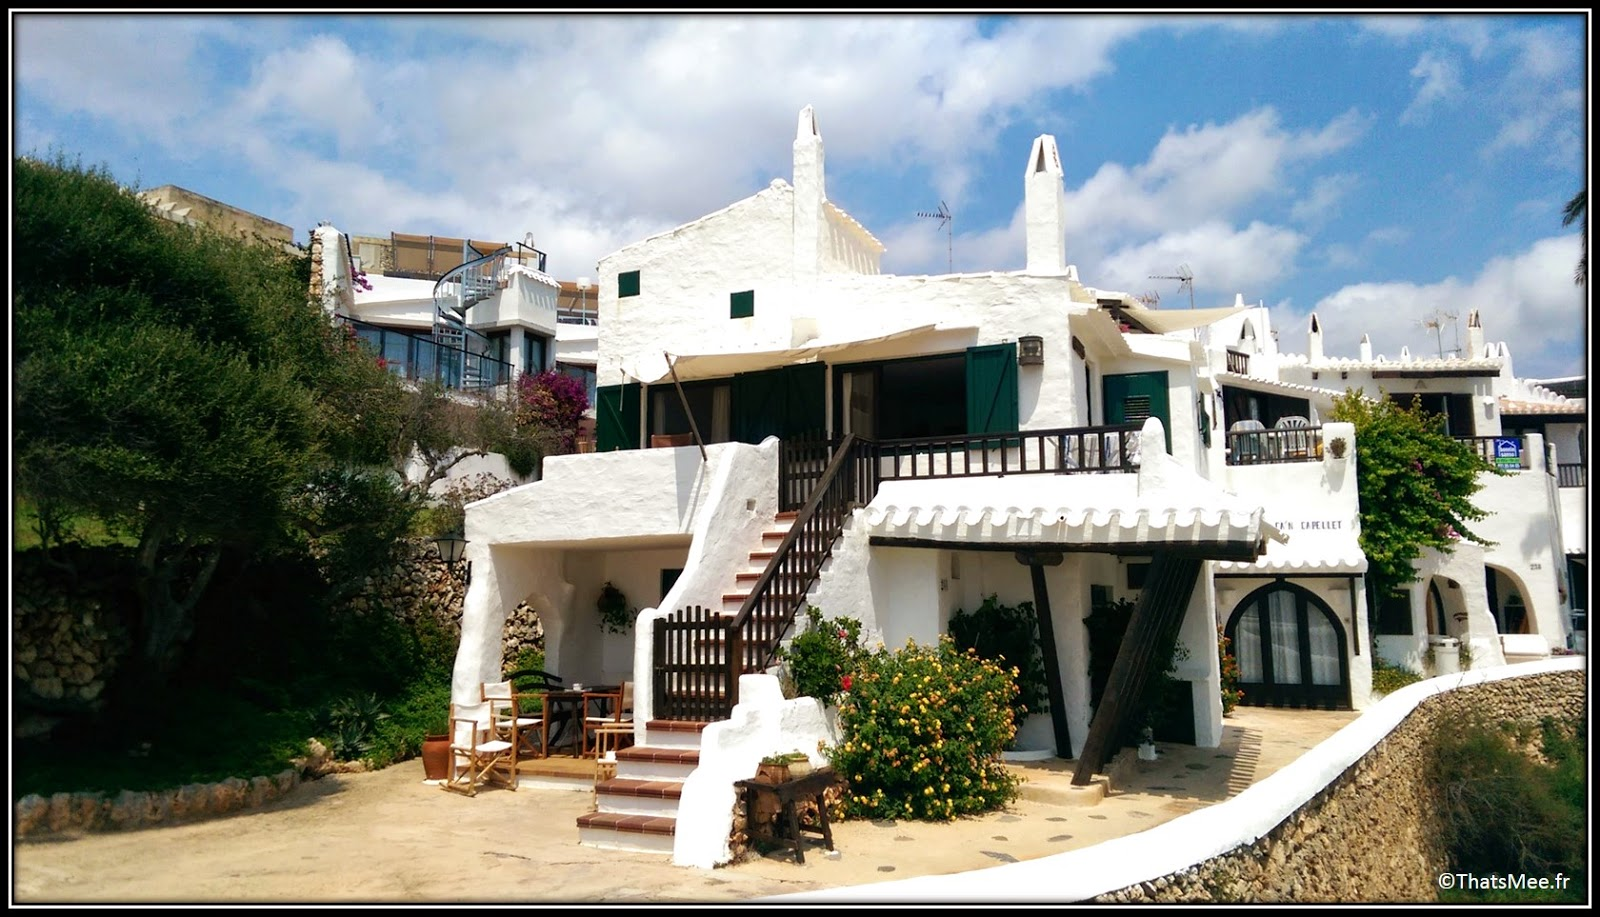 Binibeca Binibequer village blanc pecheurs Menorca Minorque escaliers maisons